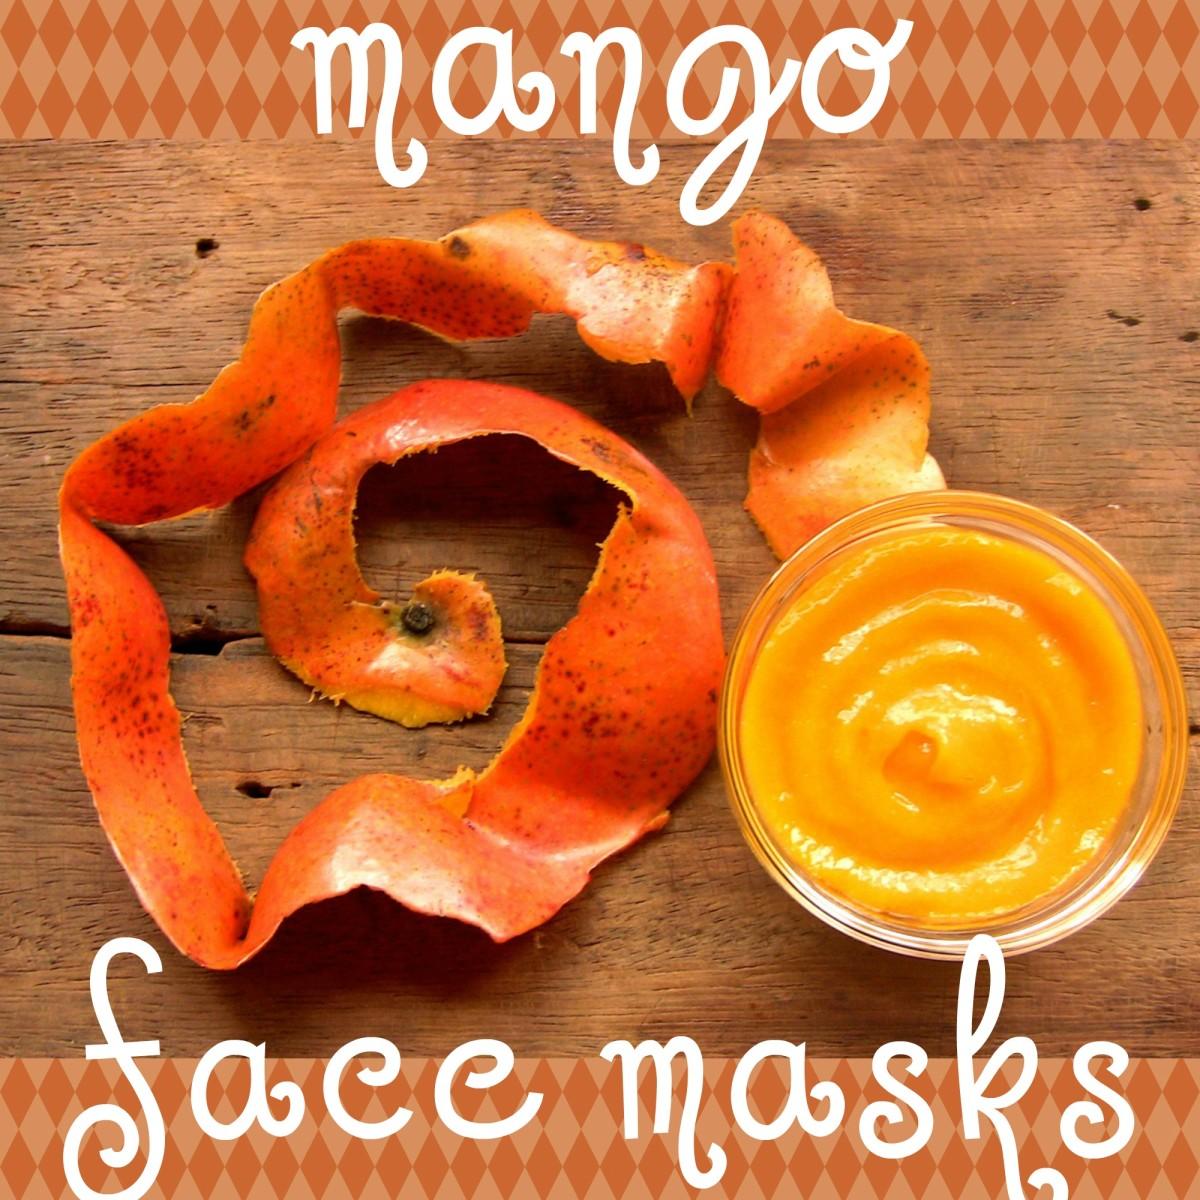 DIY Mango Face Mask Recipes for Beautiful Skin